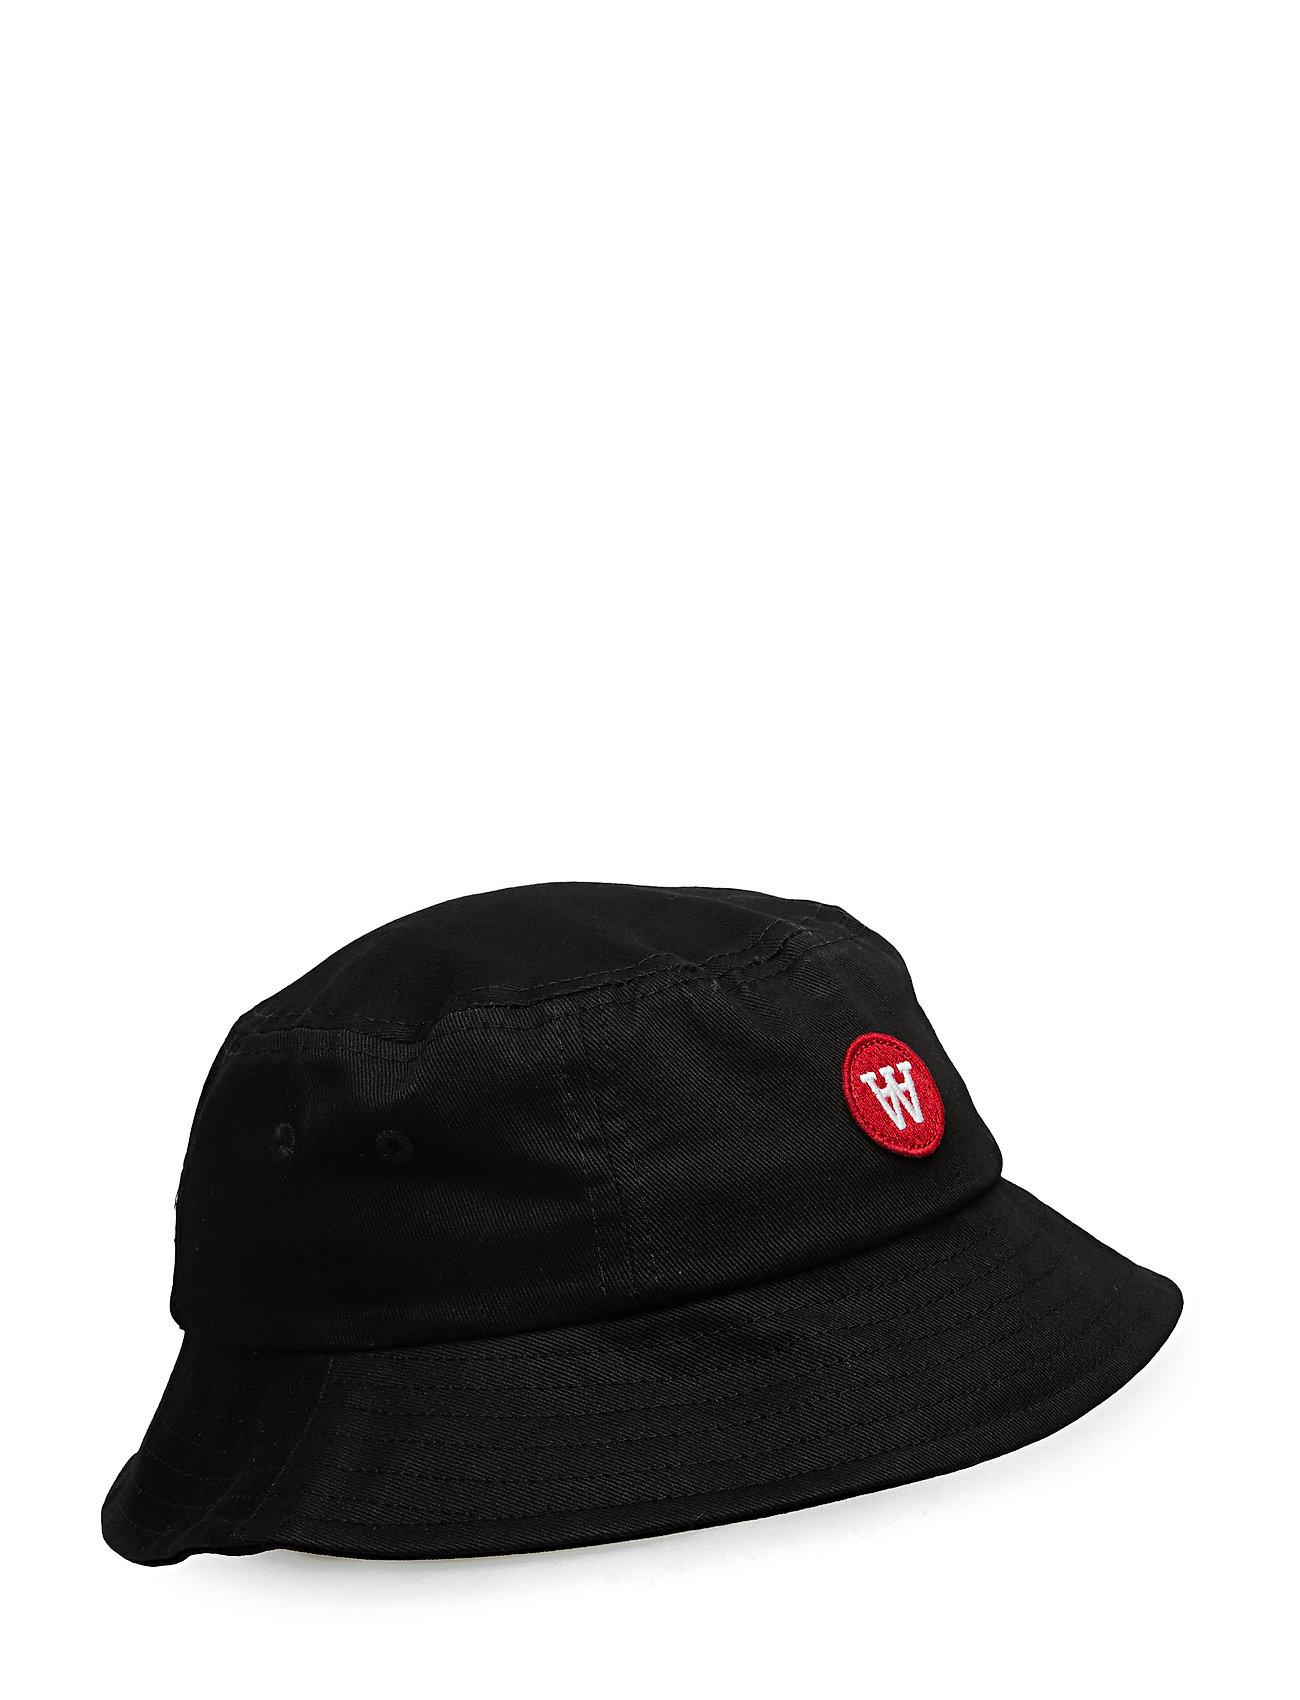 a74bdc674e3 Val Kids Bucket Hat (Black) (£35) - Wood Wood -